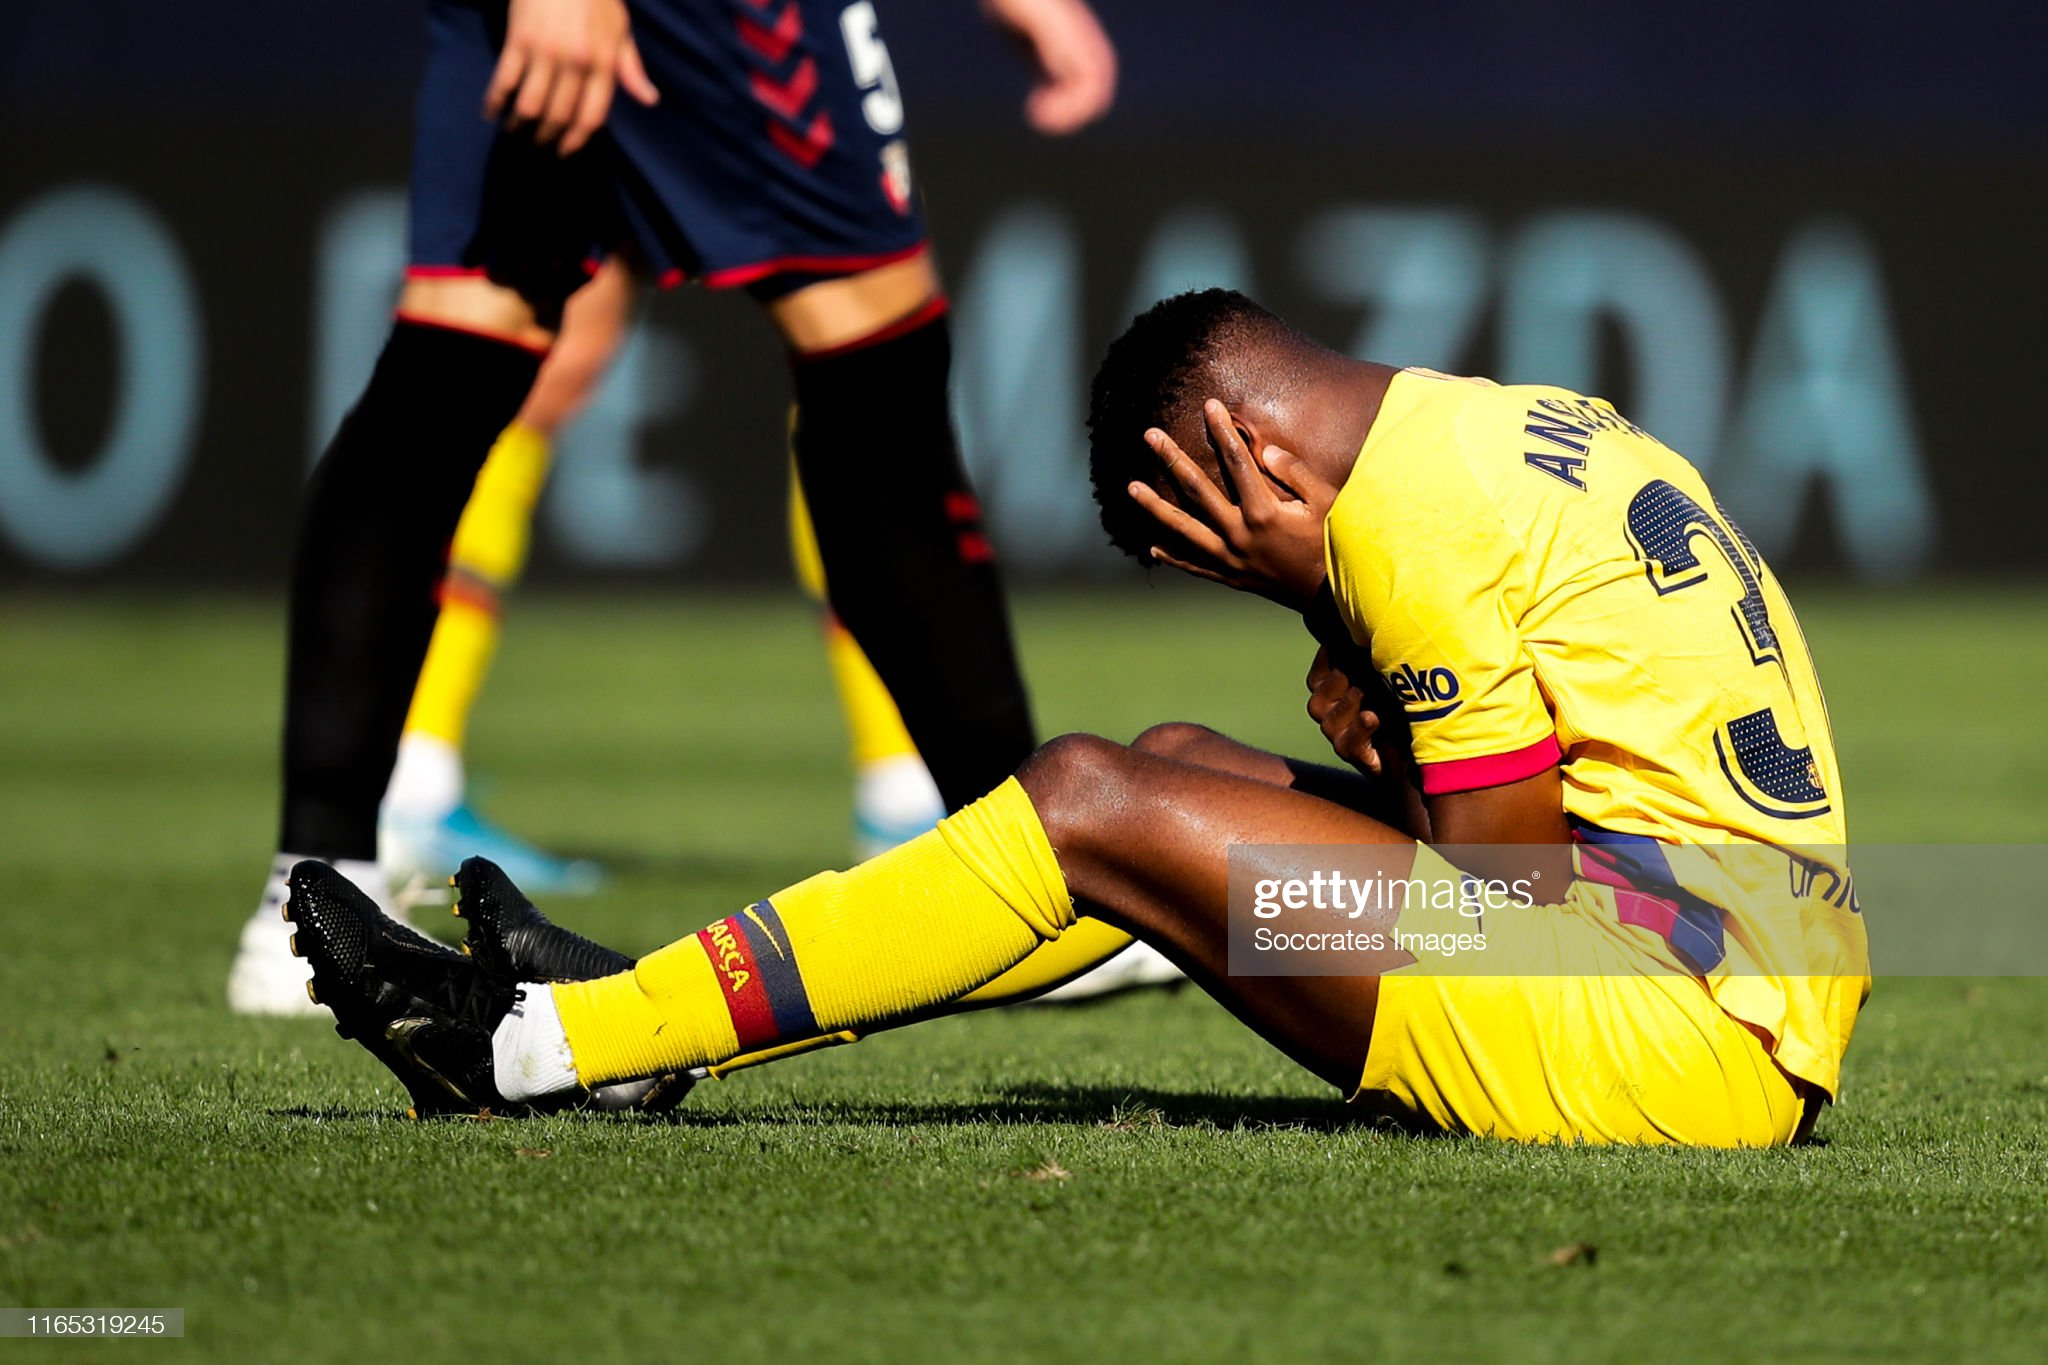 صور مباراة : أوساسونا - برشلونة 2-2 ( 31-08-2019 )  Ansu-fati-of-fc-barcelona-during-the-la-liga-santander-match-between-picture-id1165319245?s=2048x2048